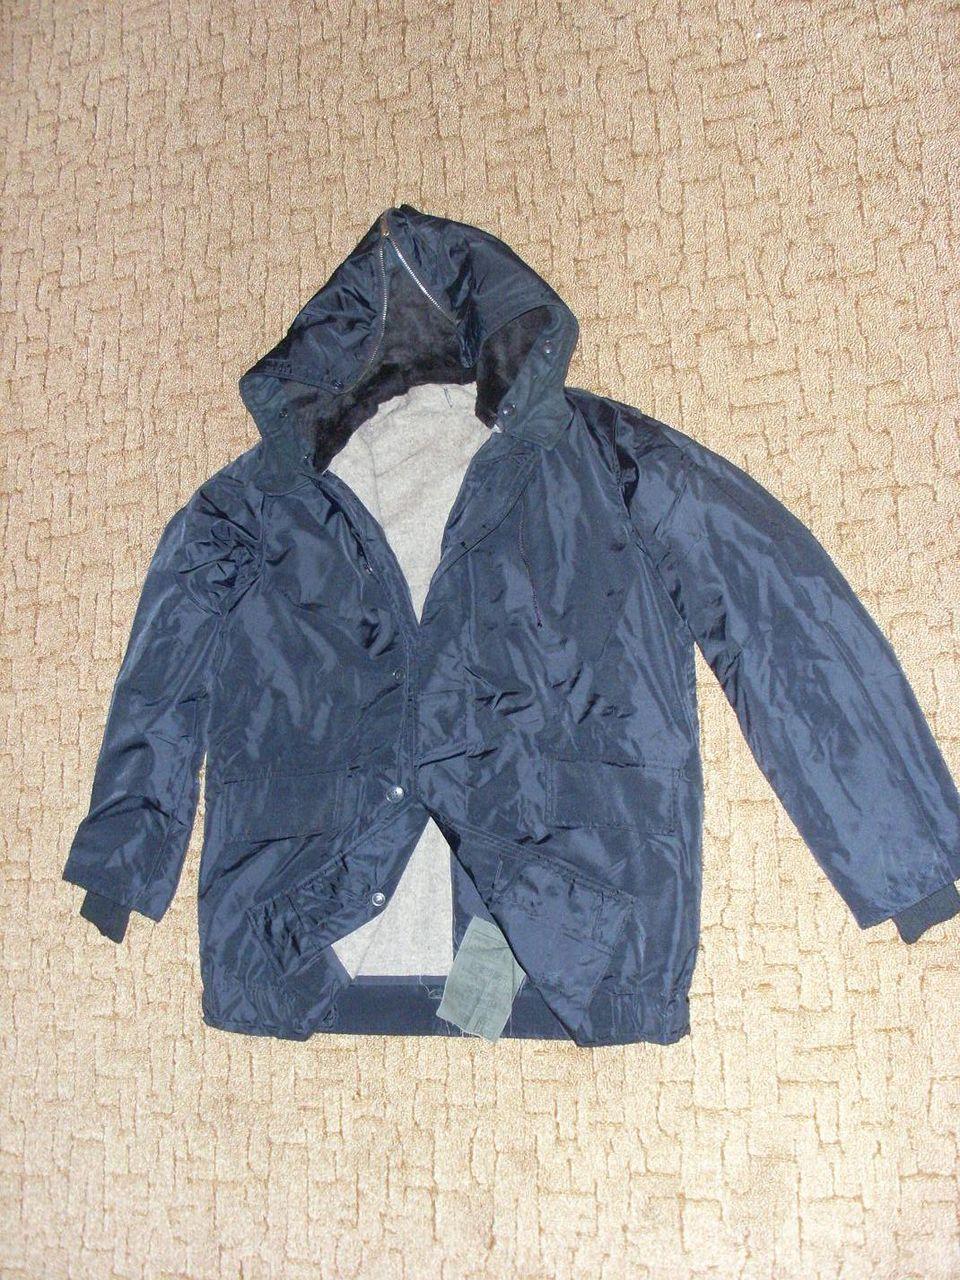 Купить Куртку Канадку Альпак